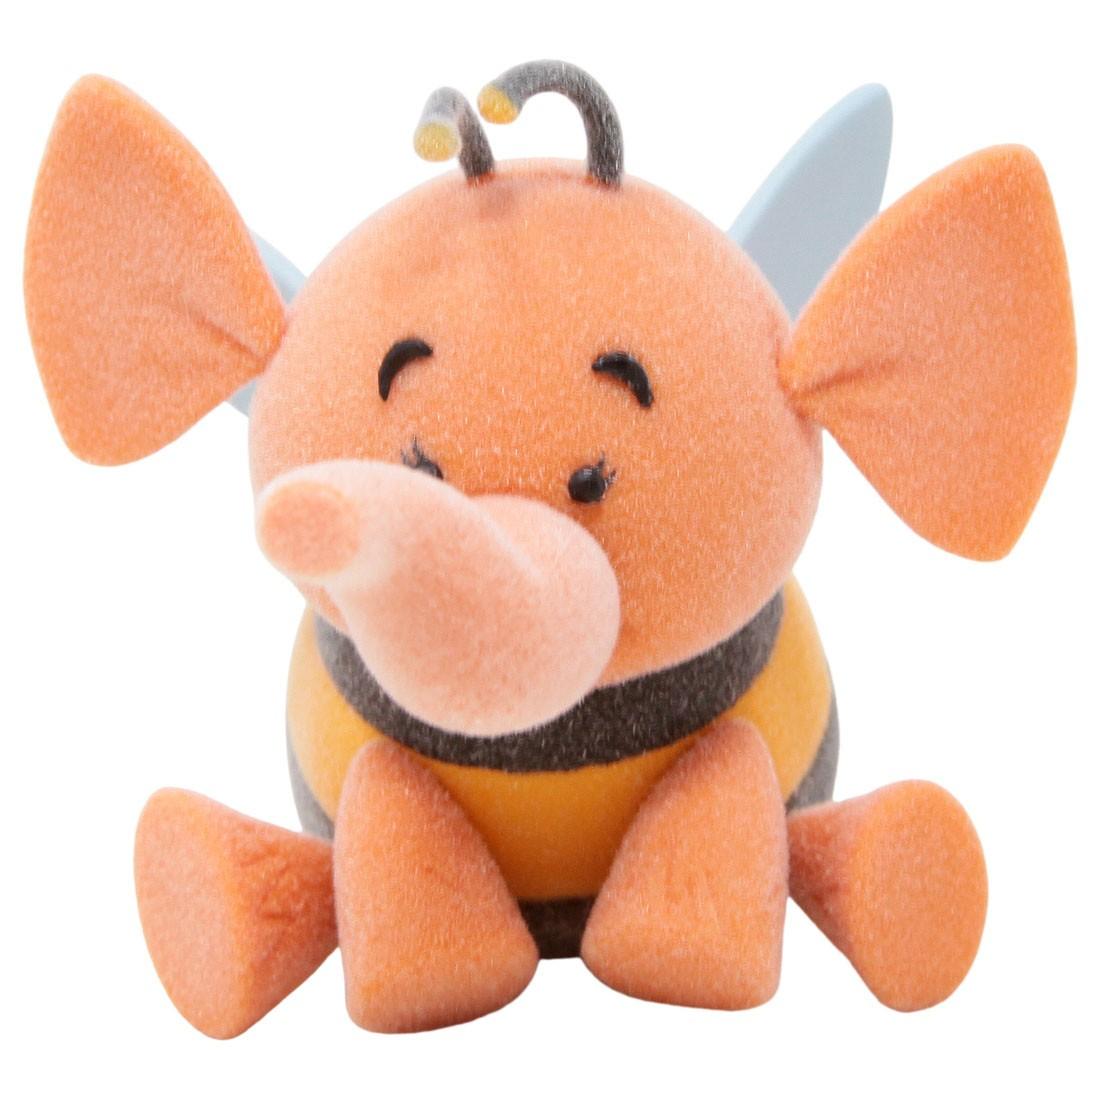 Banpresto Fluffy Puffy Petit Disney Characters Winnie-The-Pooh Vol.2 - Heffalump Figure (orange)